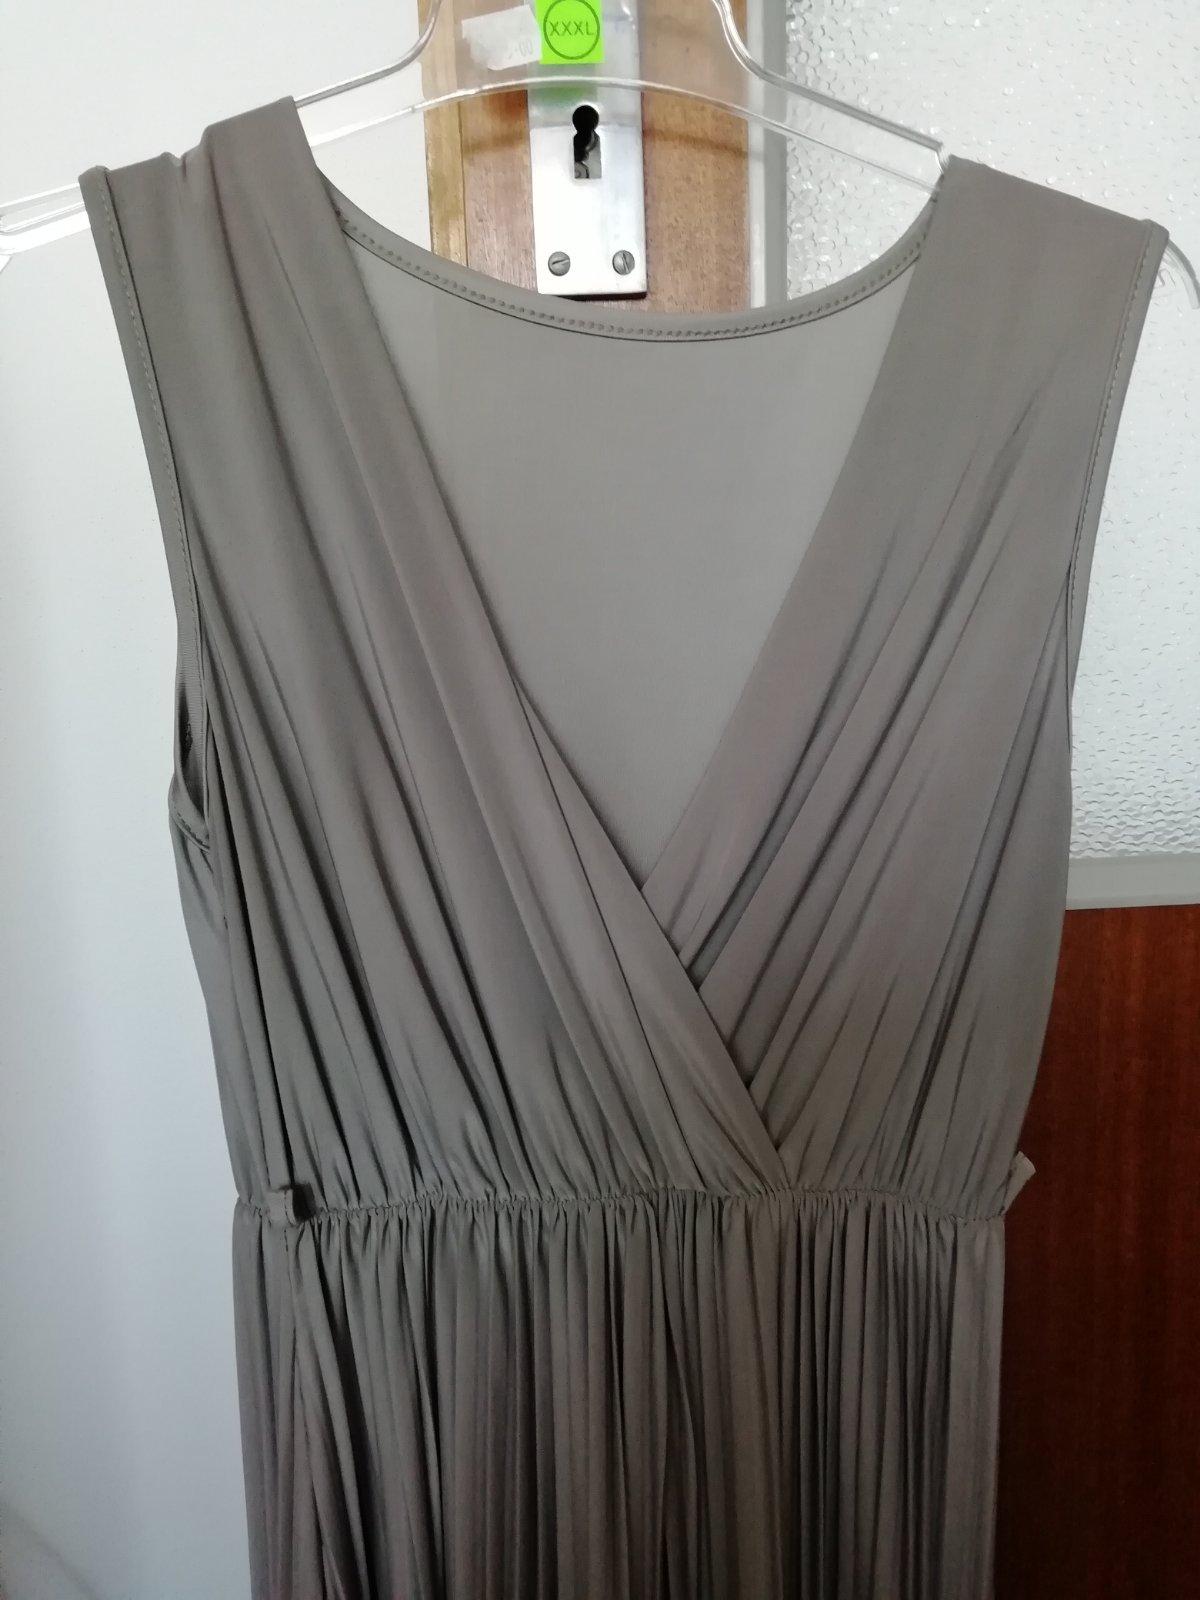 Šaty s plisovanou suknou - Obrázok č. 2